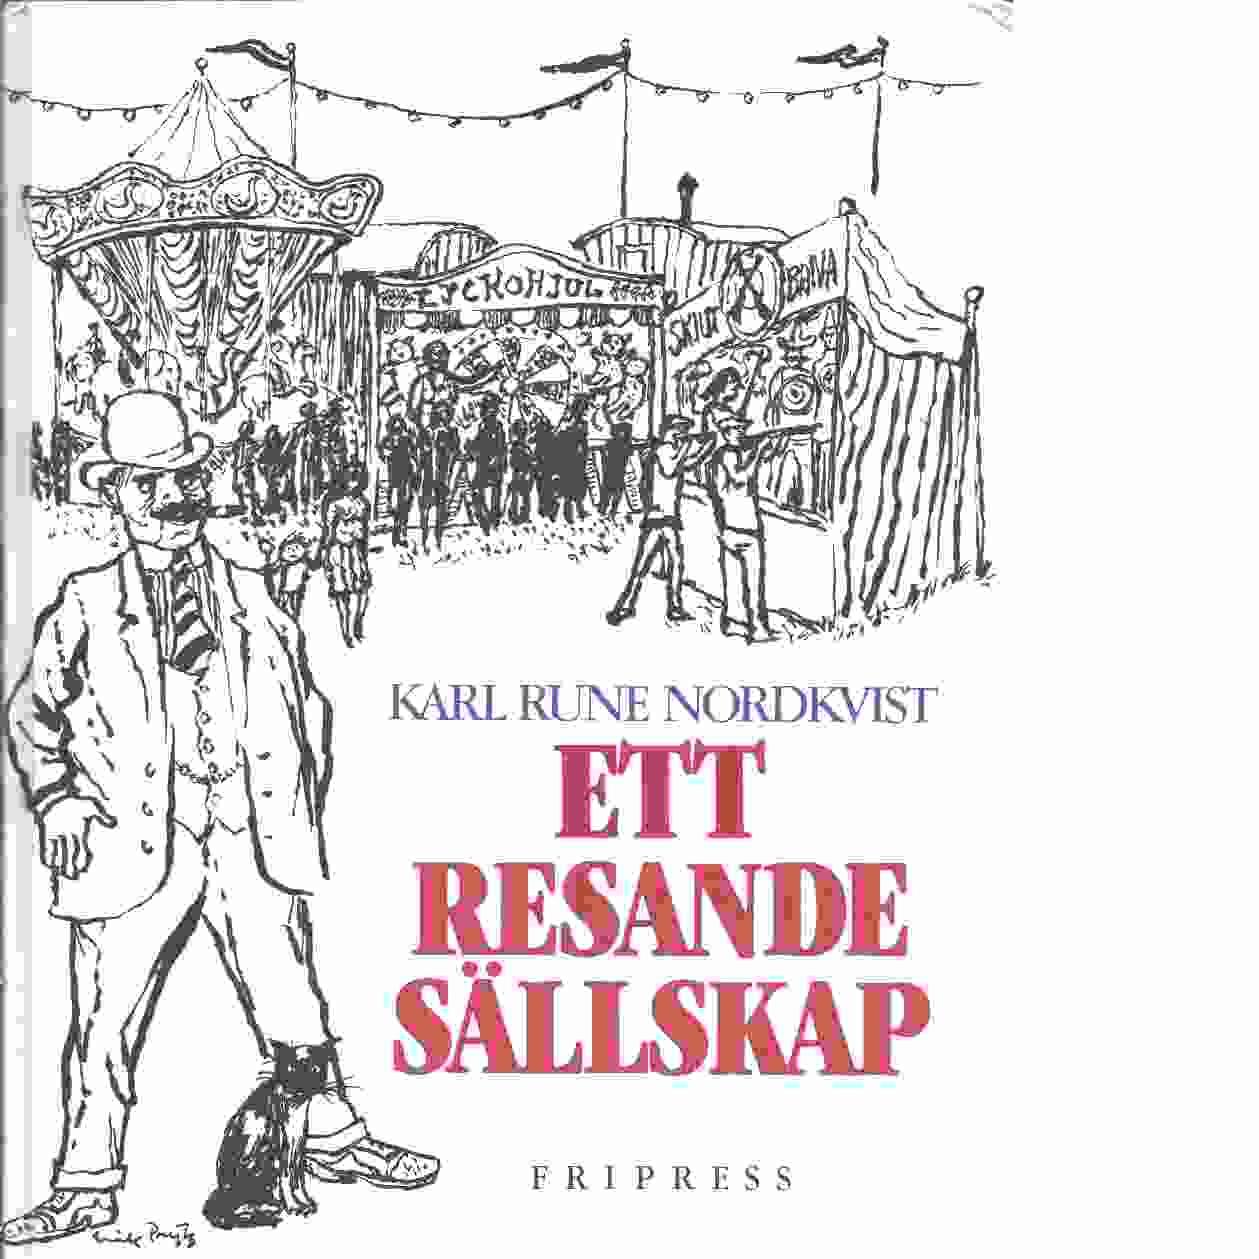 Ett resande sällskap - Nordkvist, Karl Rune